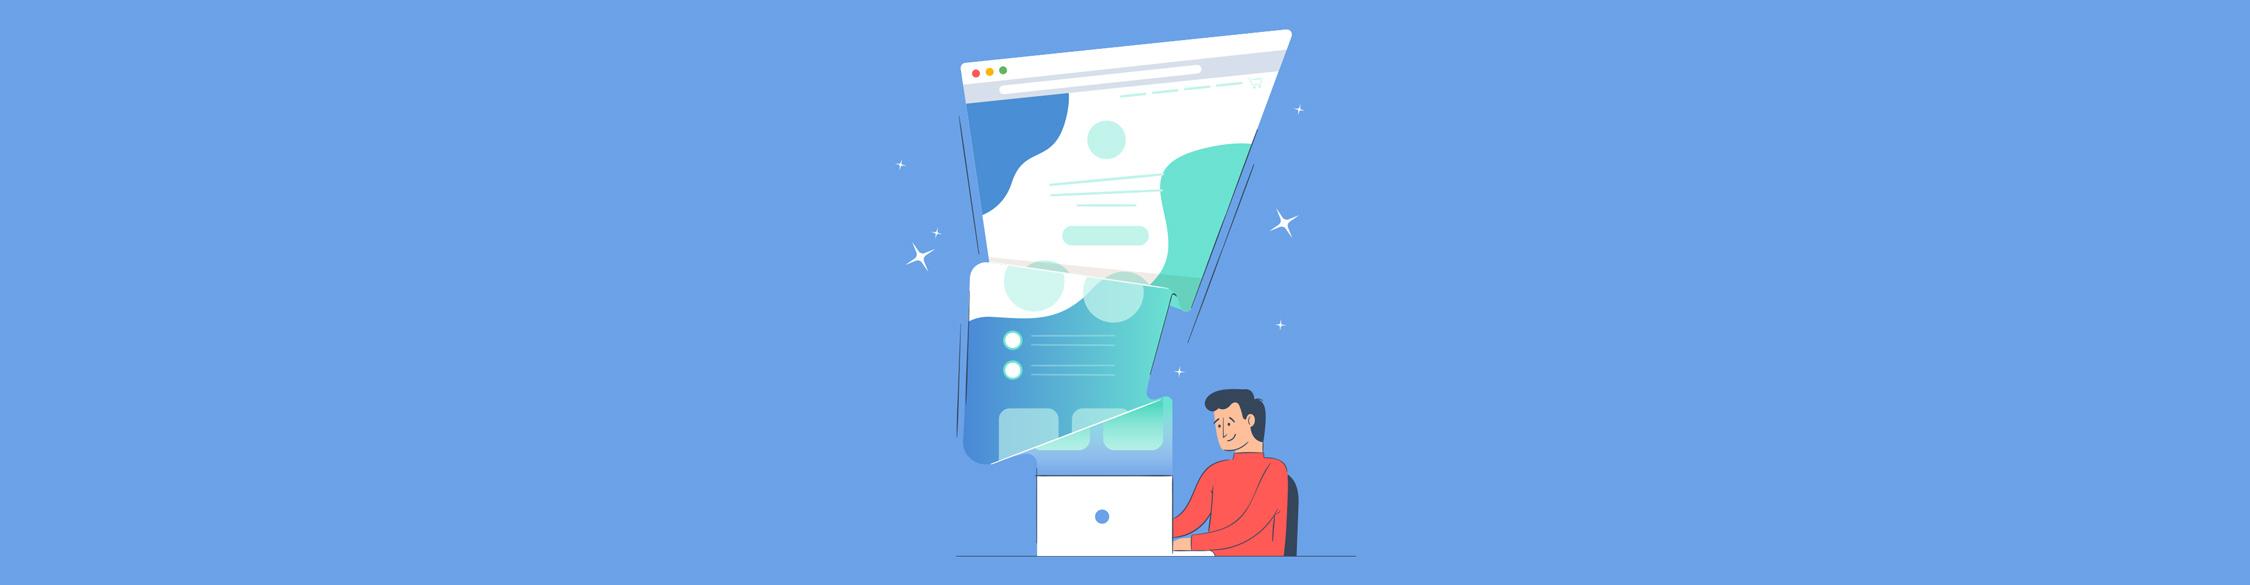 web design ideas - header